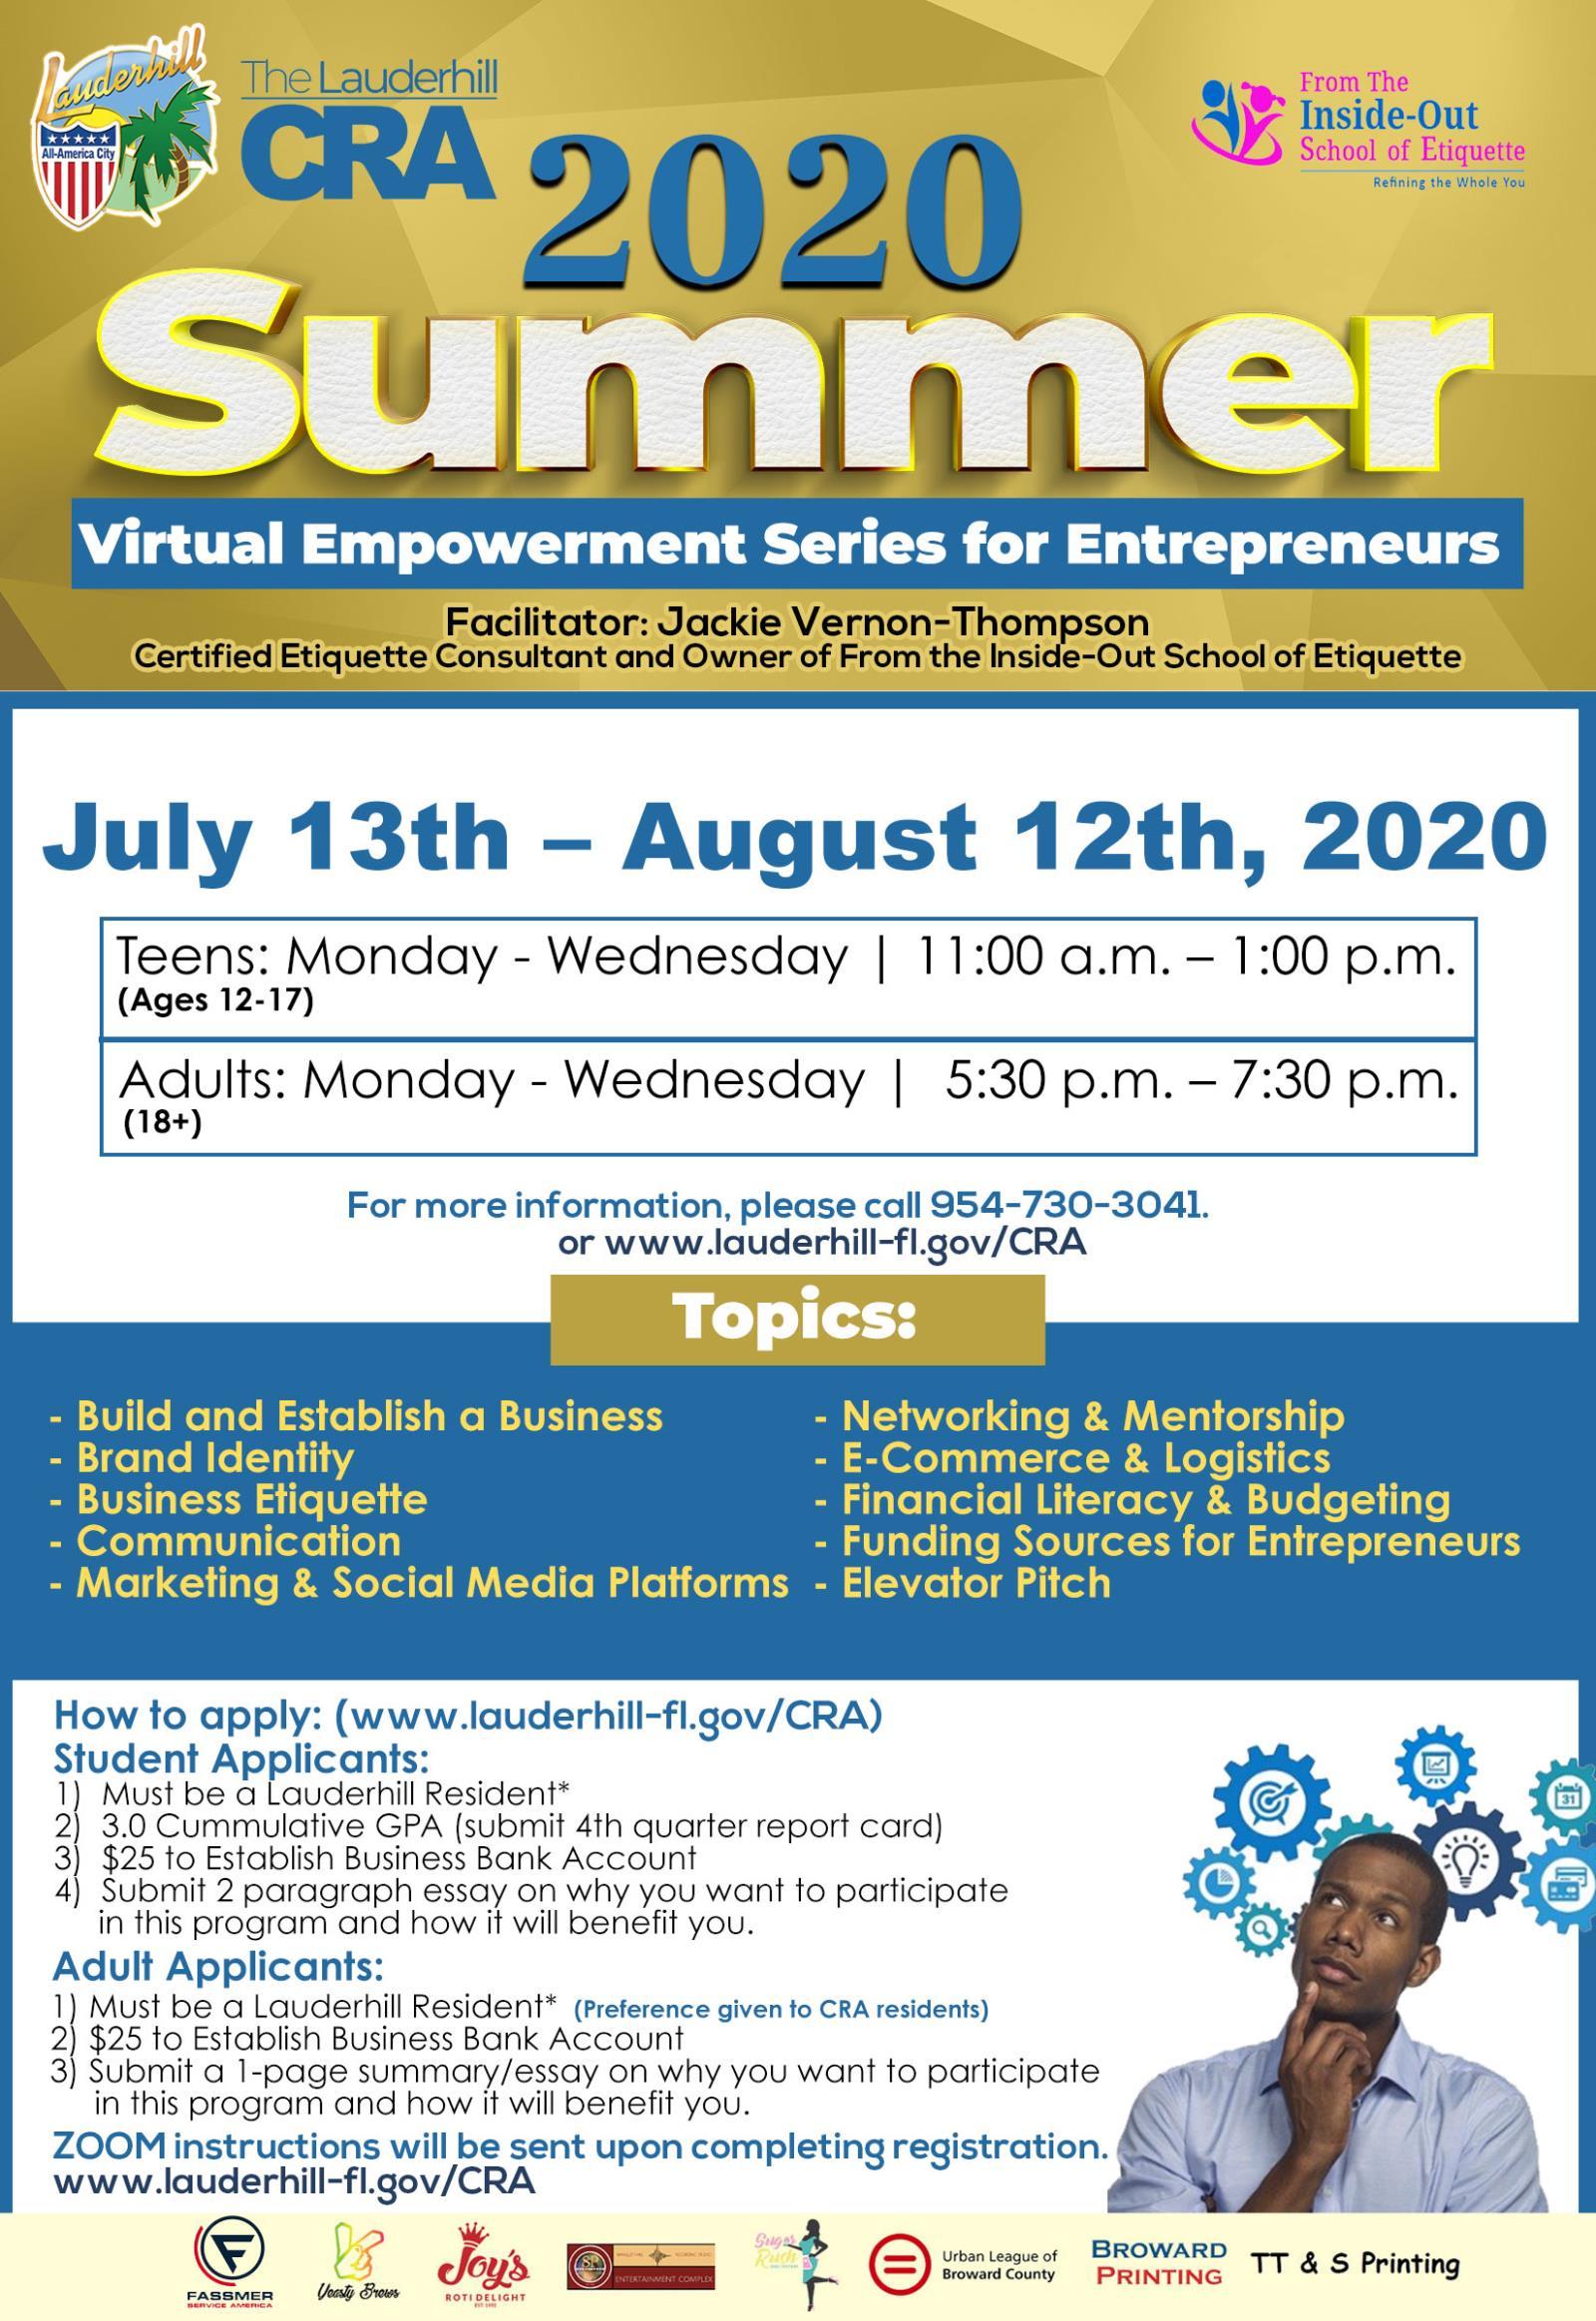 7-13-20 to 8-12-20 - Virtual Summer Empowerment Series for Entrepreneurs